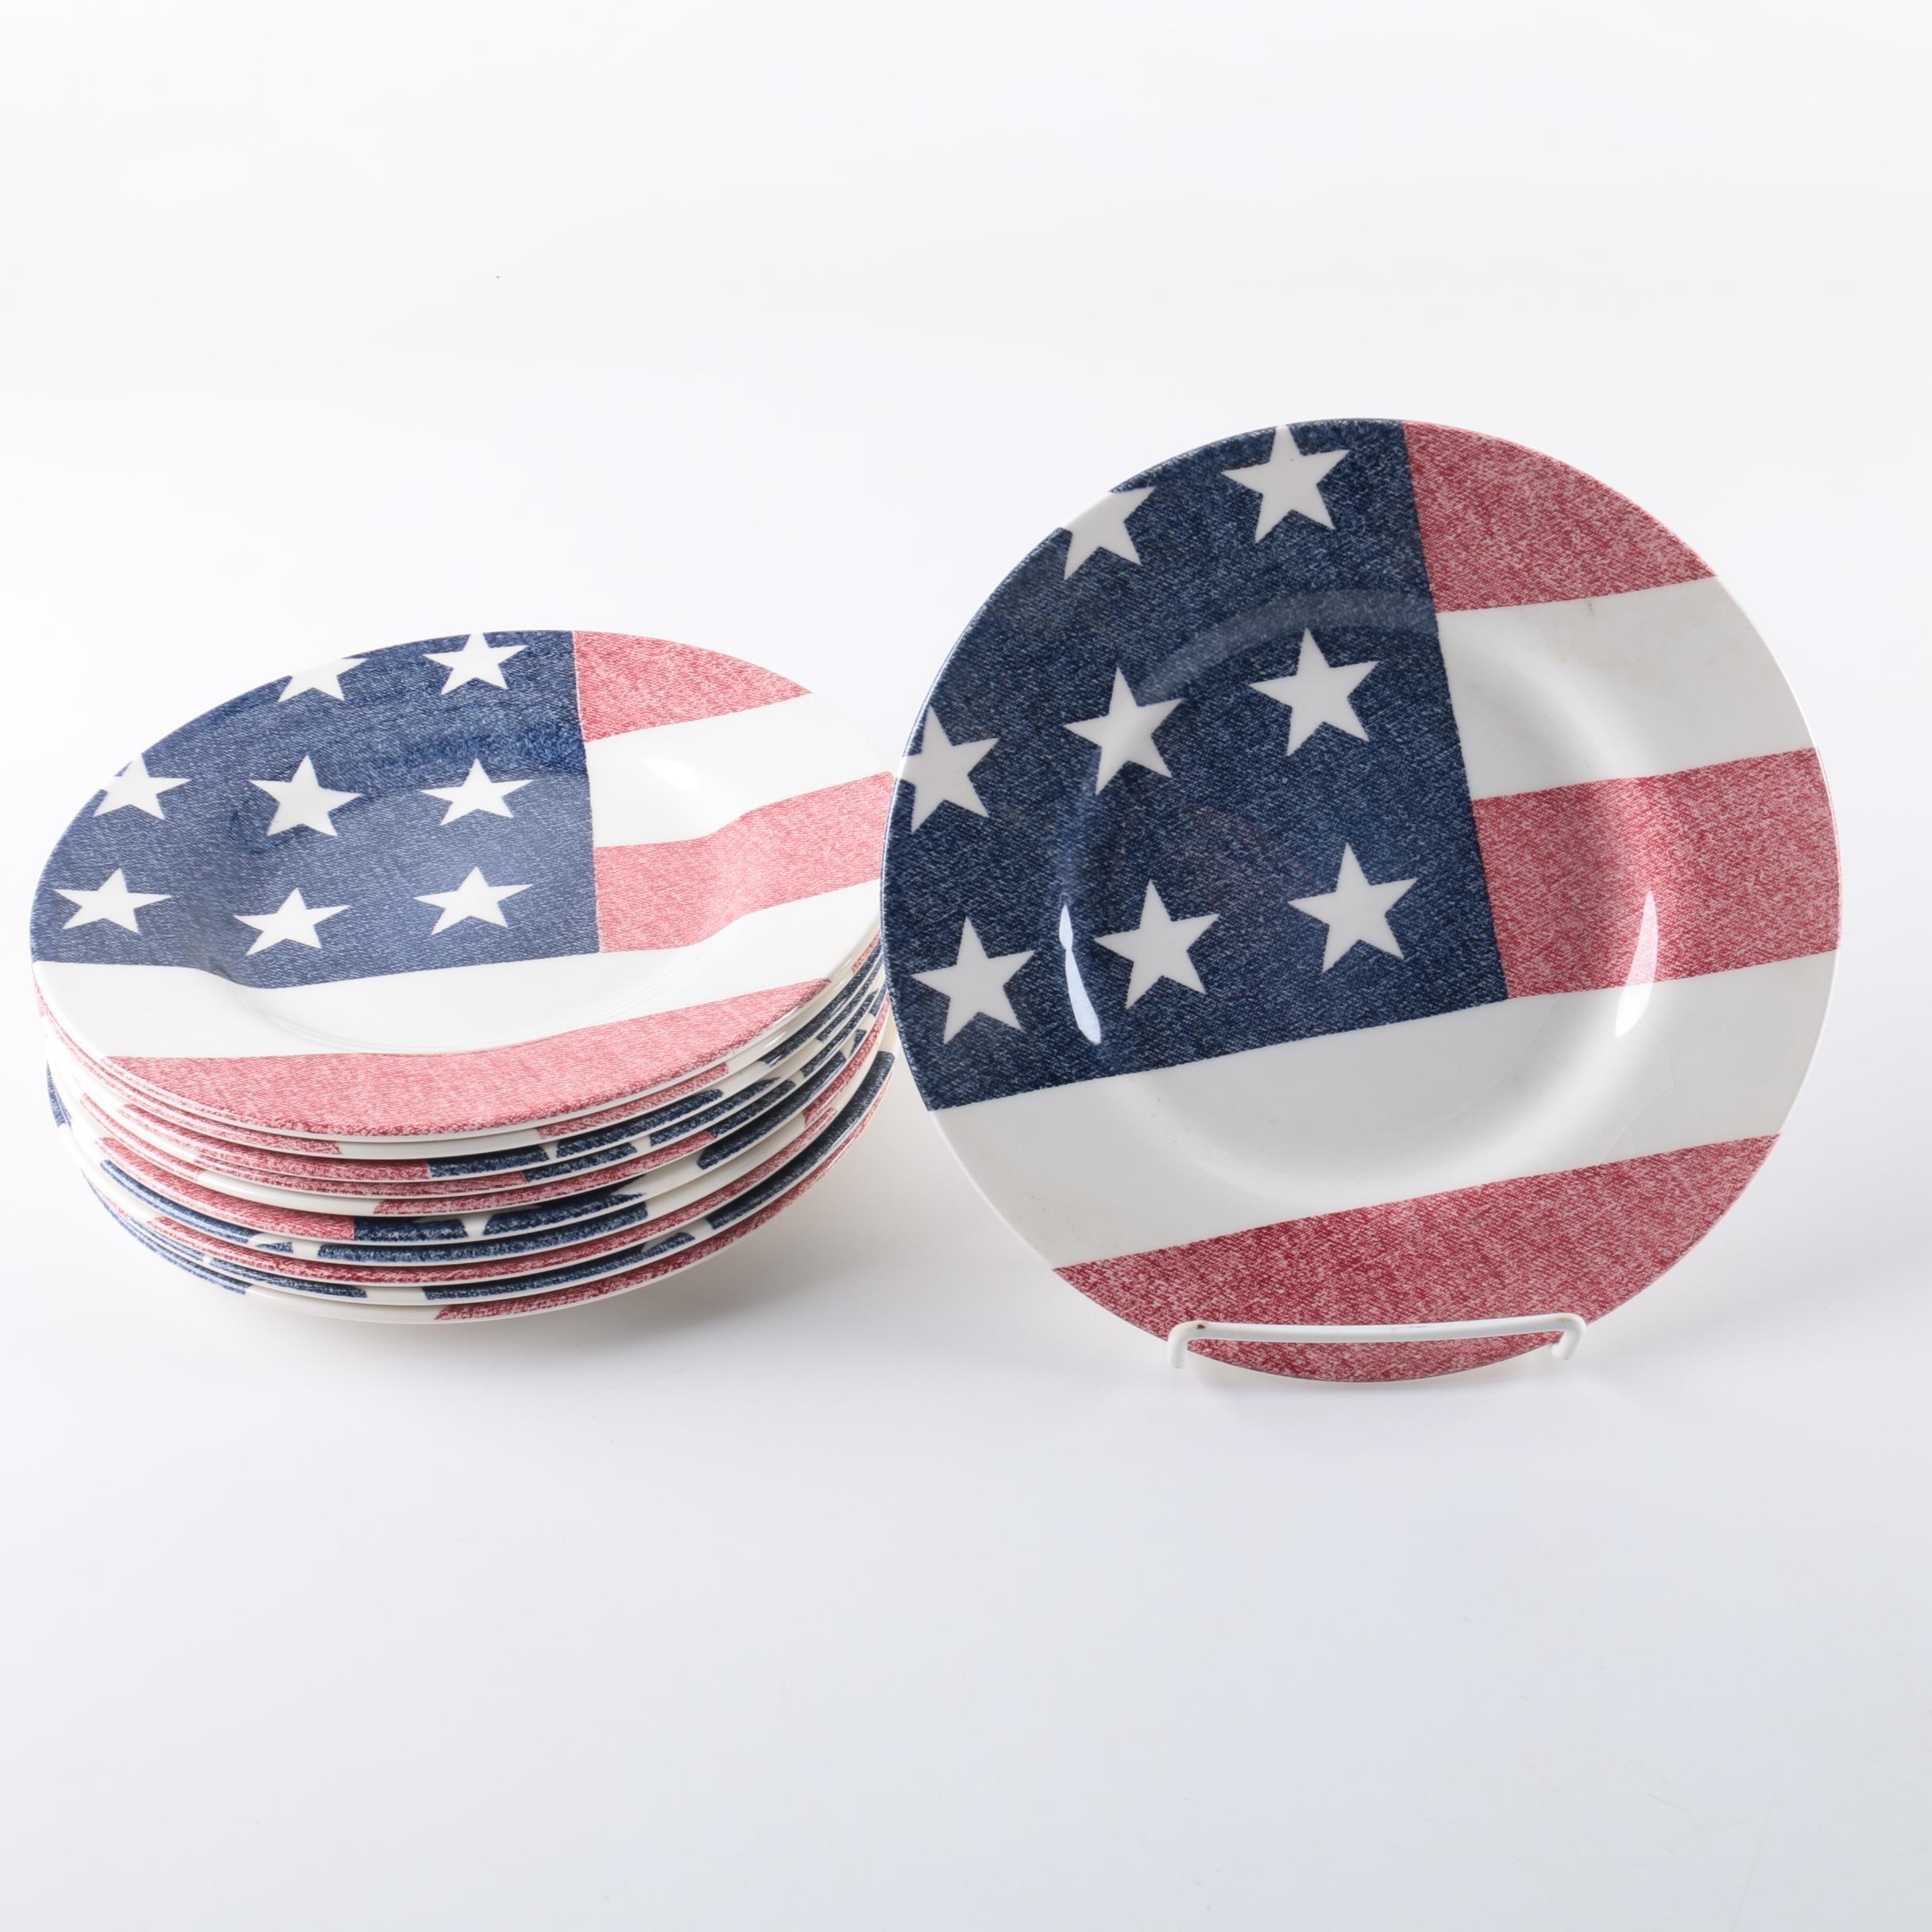 Royal Stafford  American Flag  Plates ... & Royal Stafford